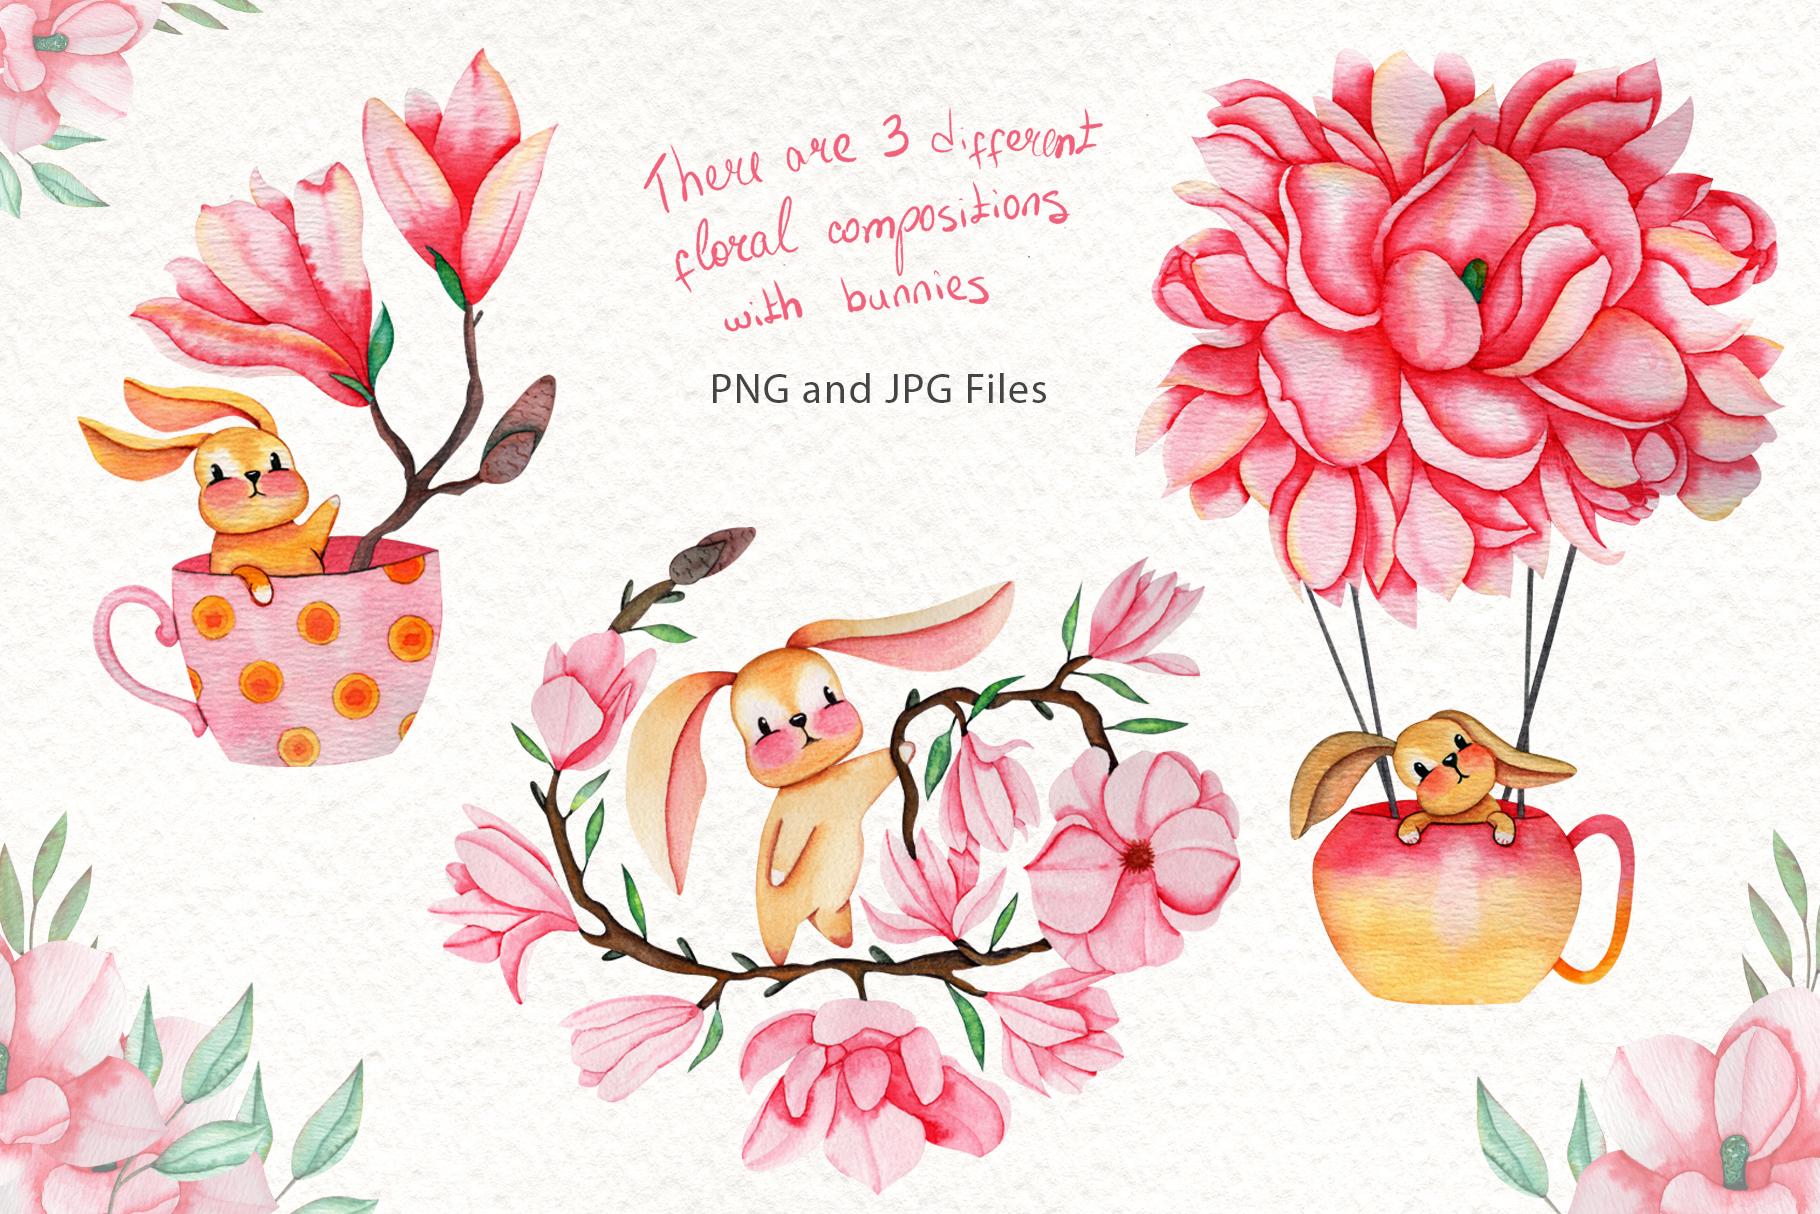 Magnolia Dream - Watercolor Illustrations example image 2